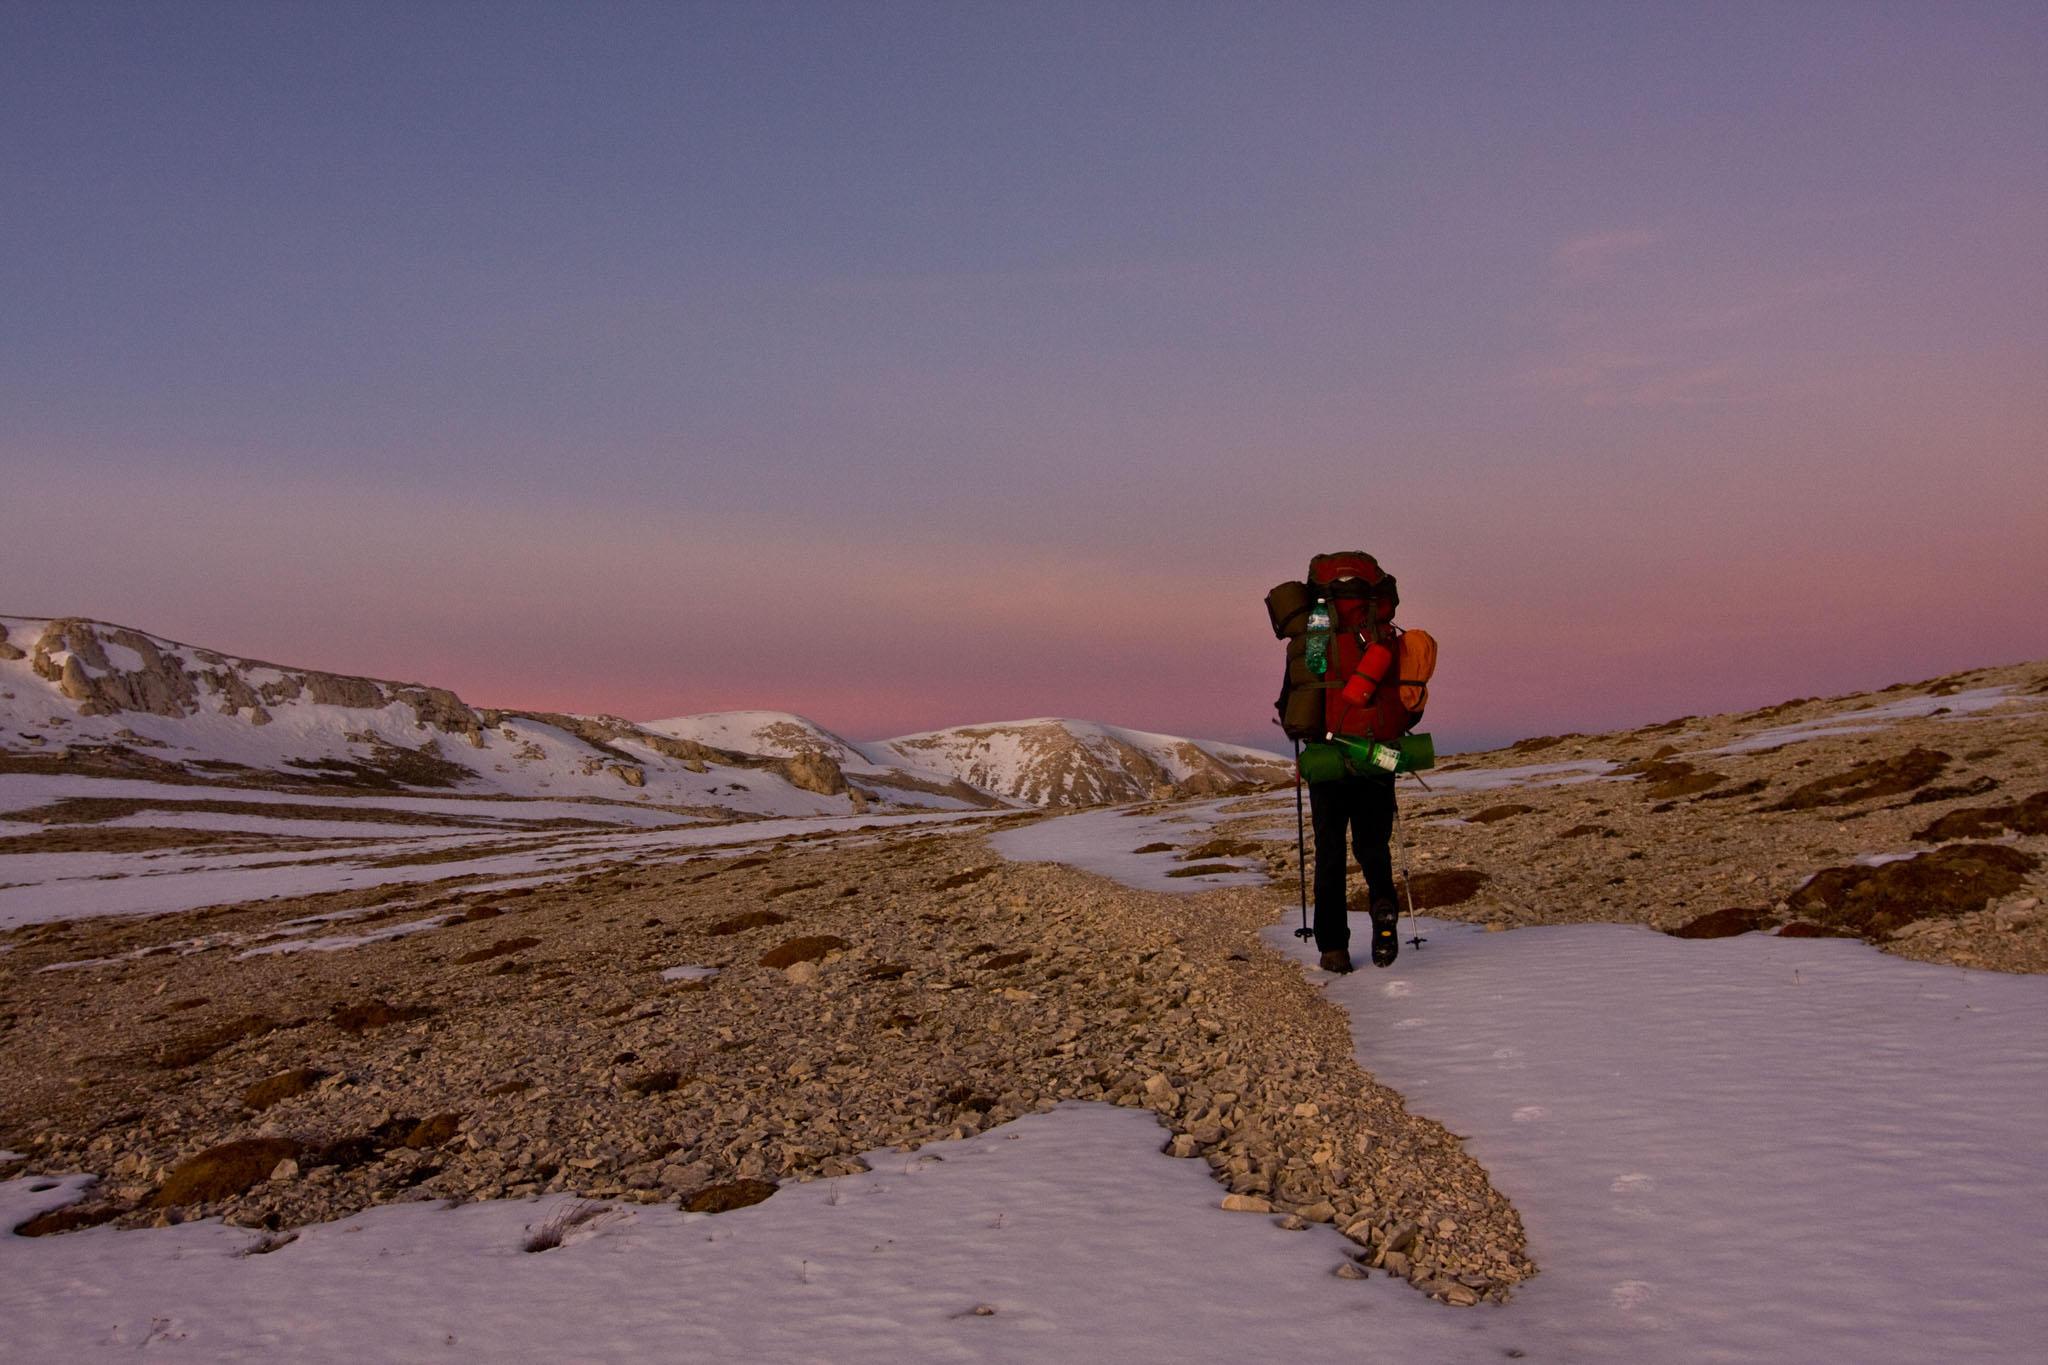 Hiker on Majella's altitude plateau. Abruzzo, Central Apennines, Italy. Oct 2009